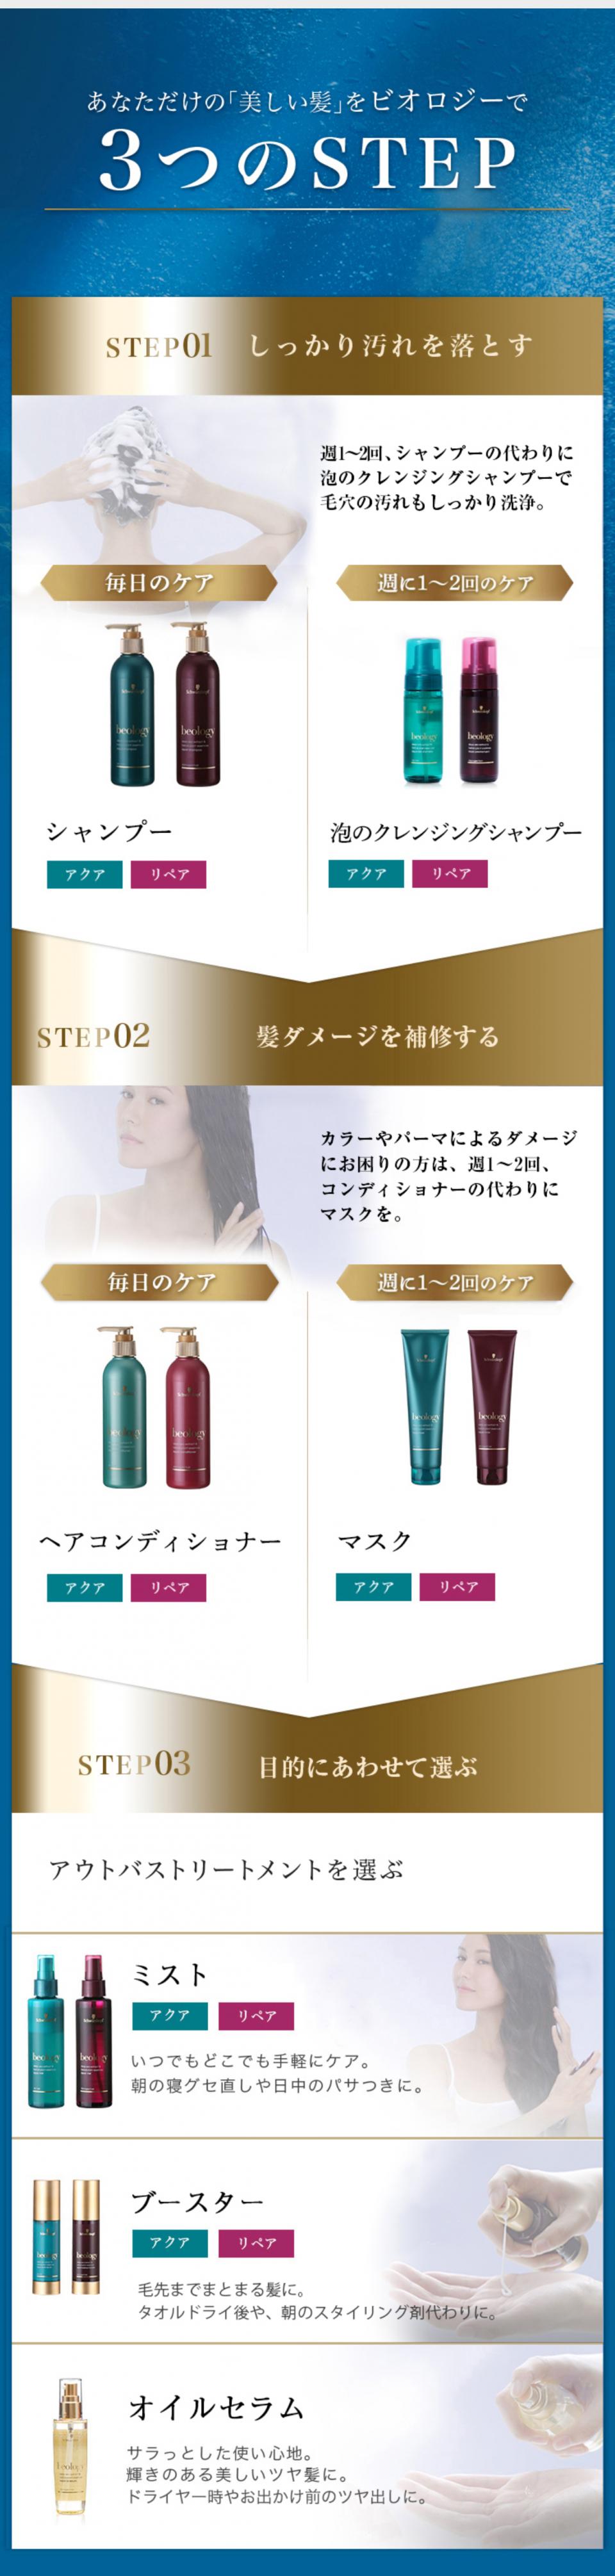 henkelbeauty.jp_landing_page_beology_tr_3steps_(iPhone 6_7_8 Plus)